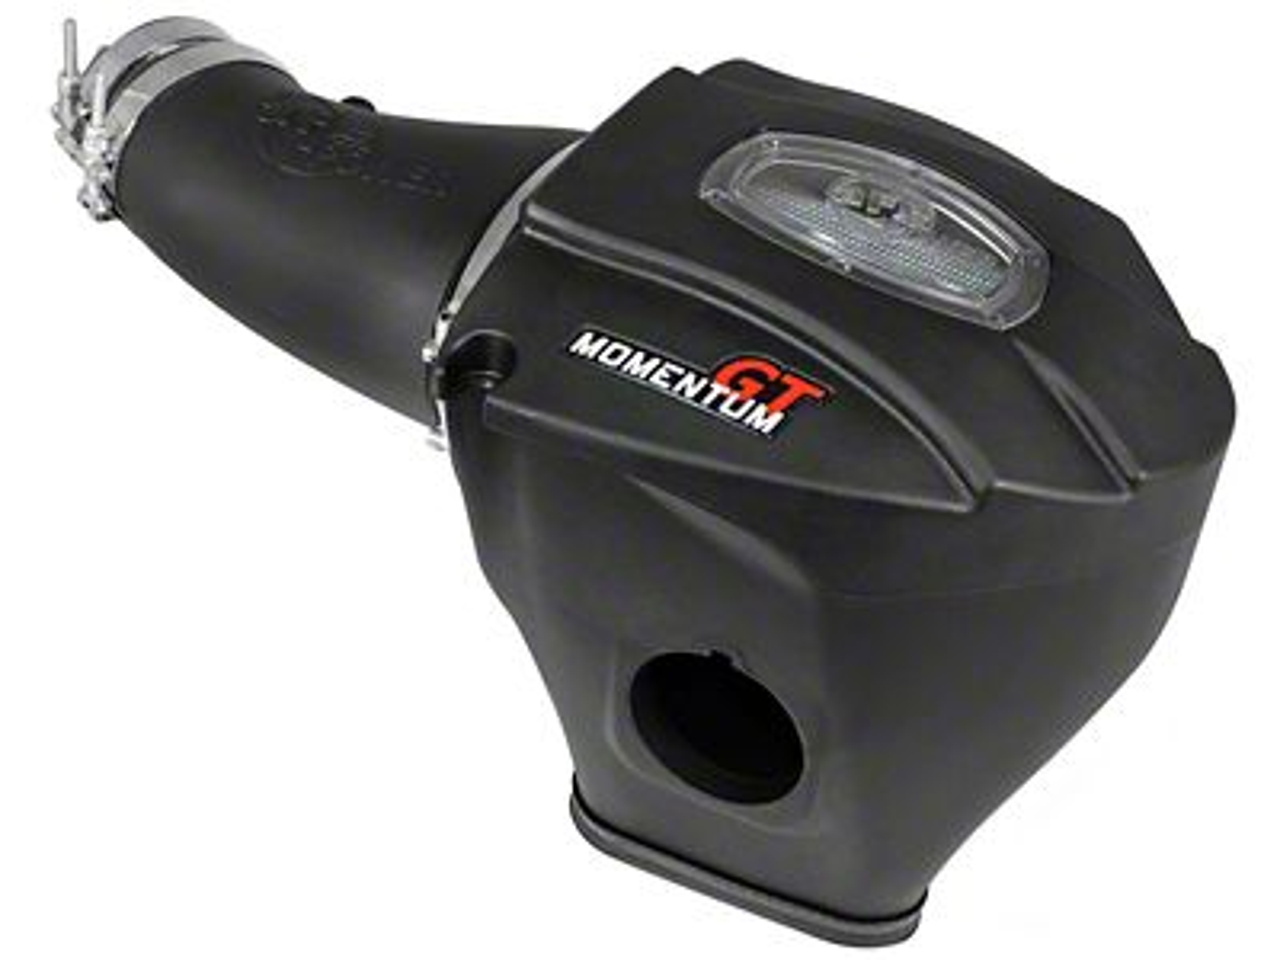 AFE Momentum GT Pro DRY S Cold Air Intake - Black (11-18 6.4L HEMI)